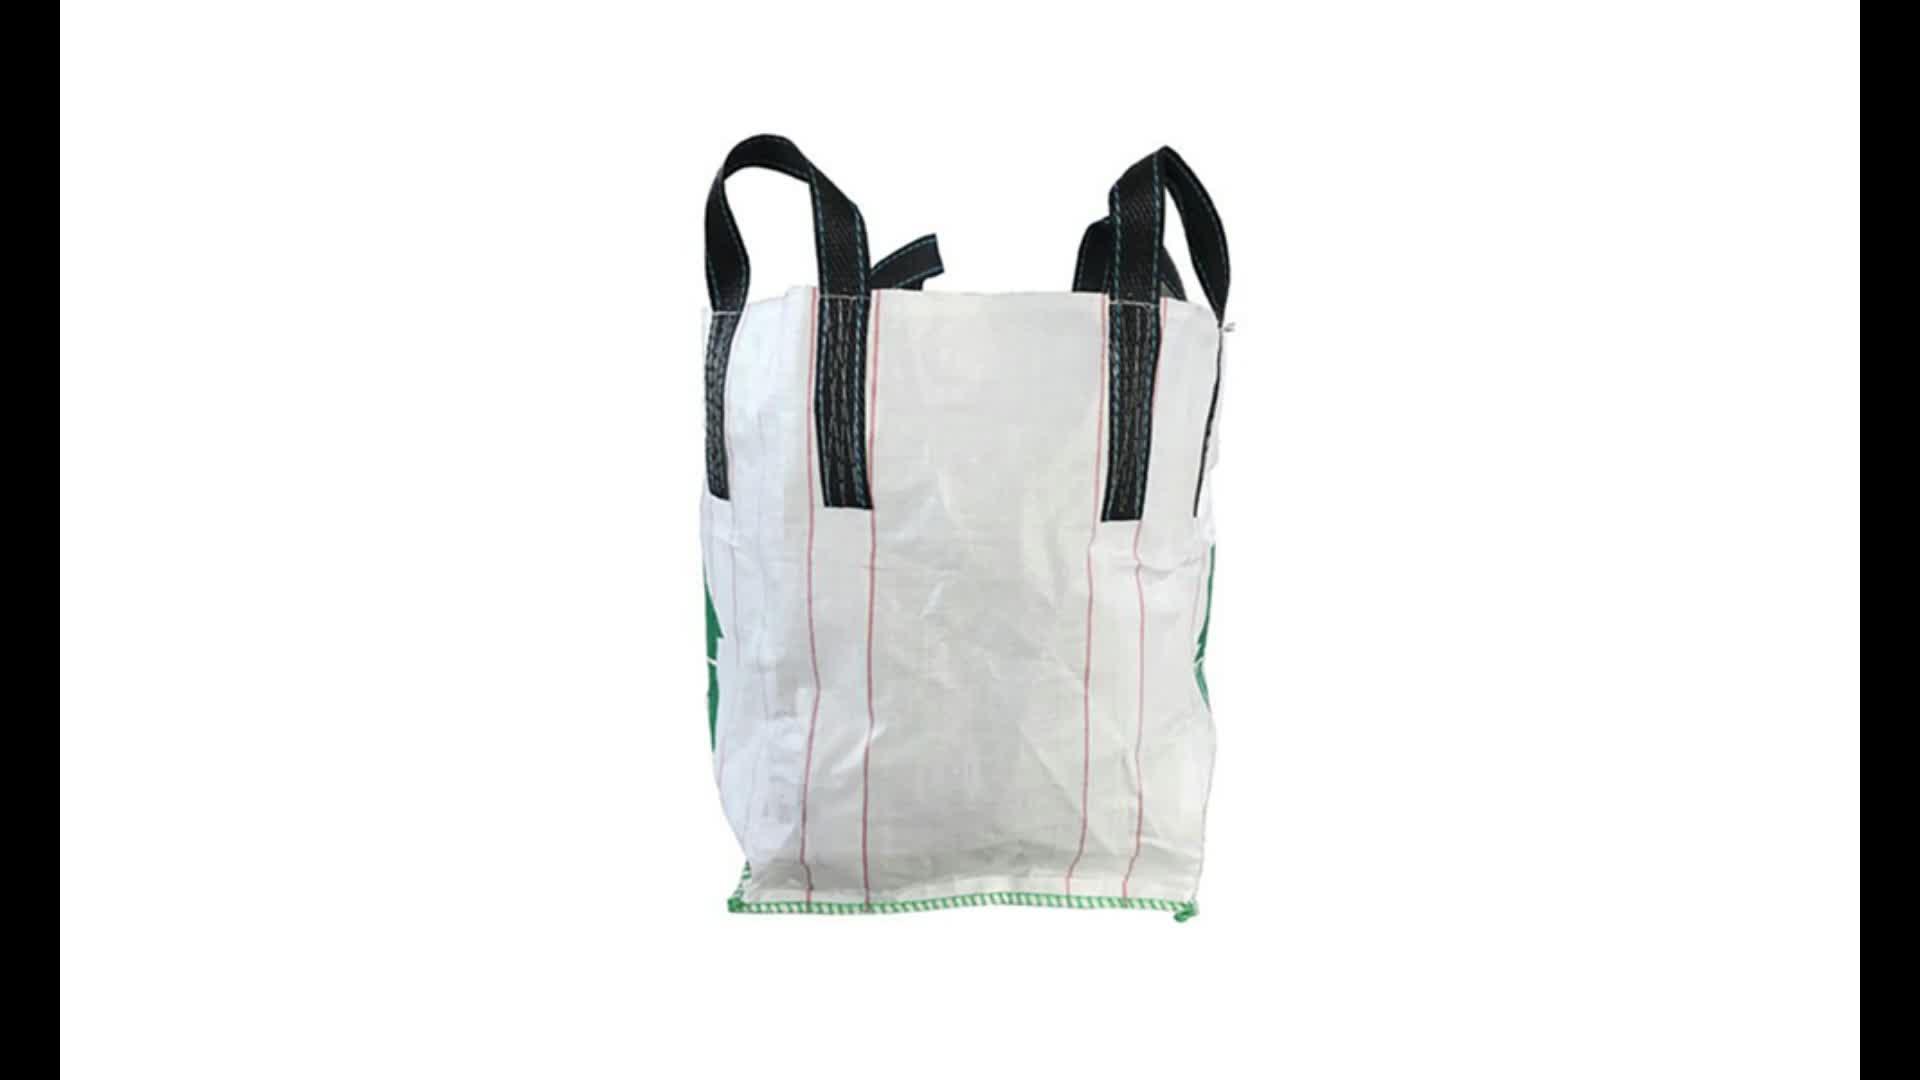 1 Ton Meststof Tas Polypropyleen Big Bags 1000Kg Cement Sling Bag